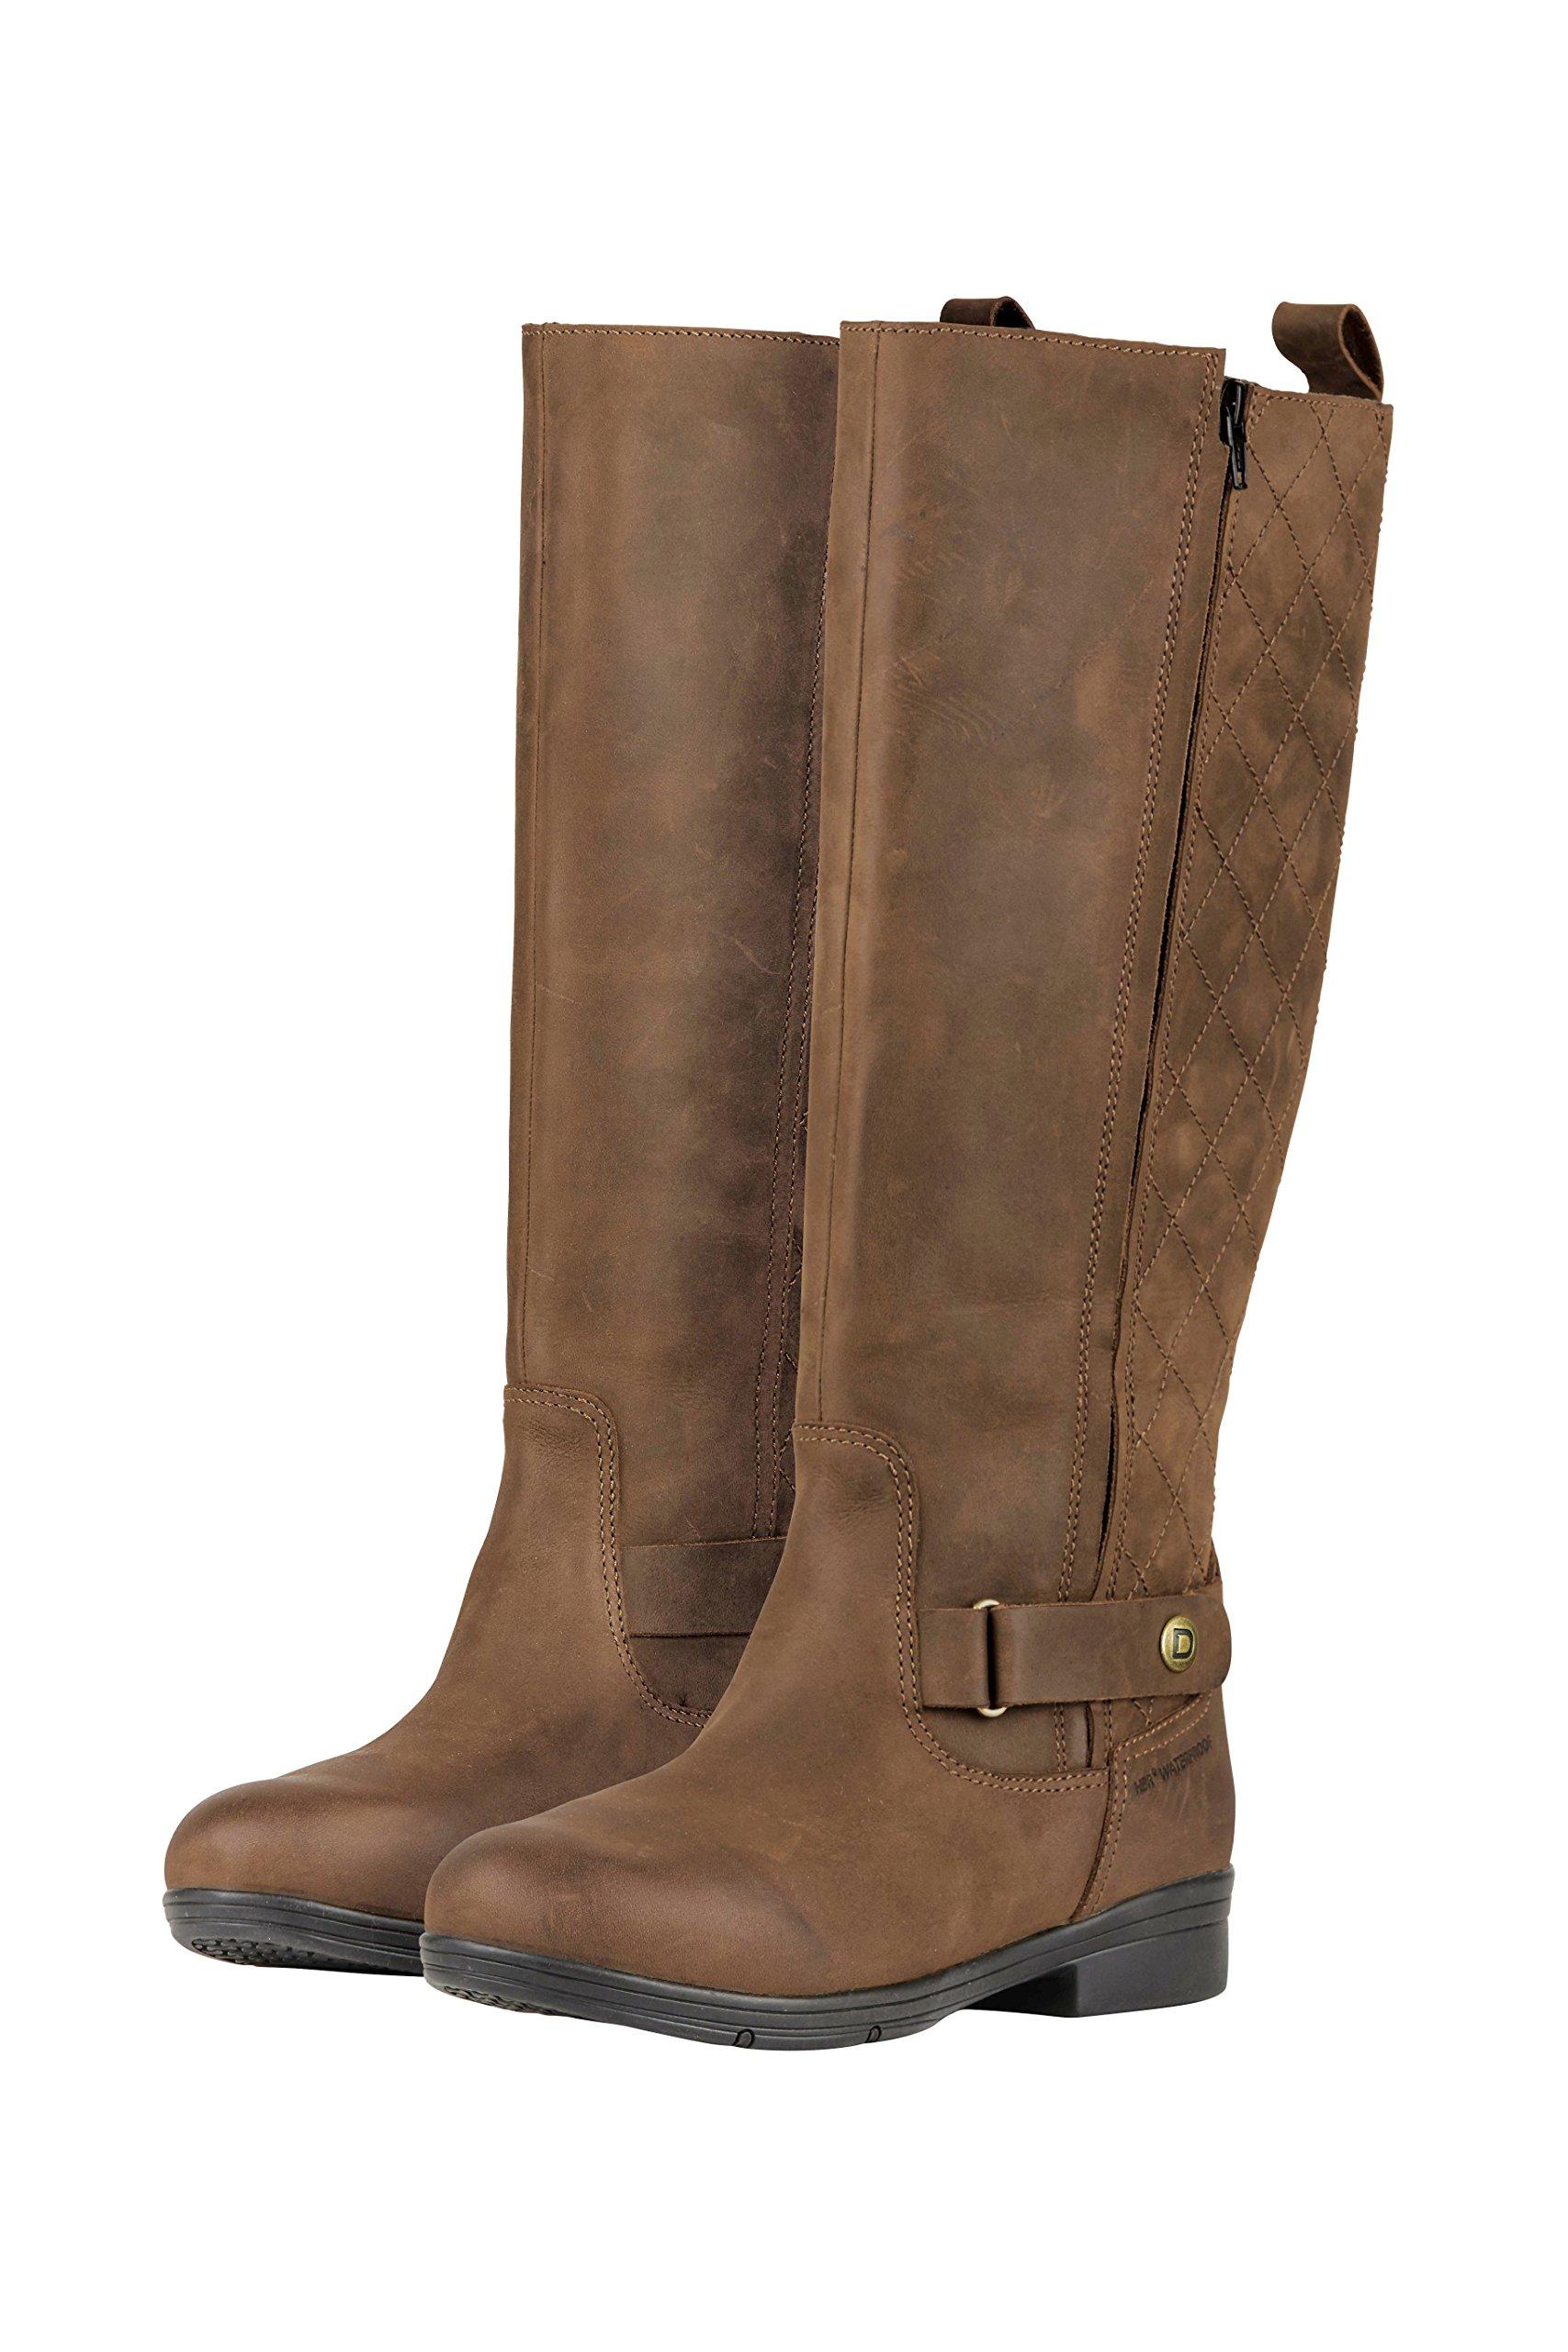 Dublin Ladies Cherwell Tall Dark Brown Boots 11